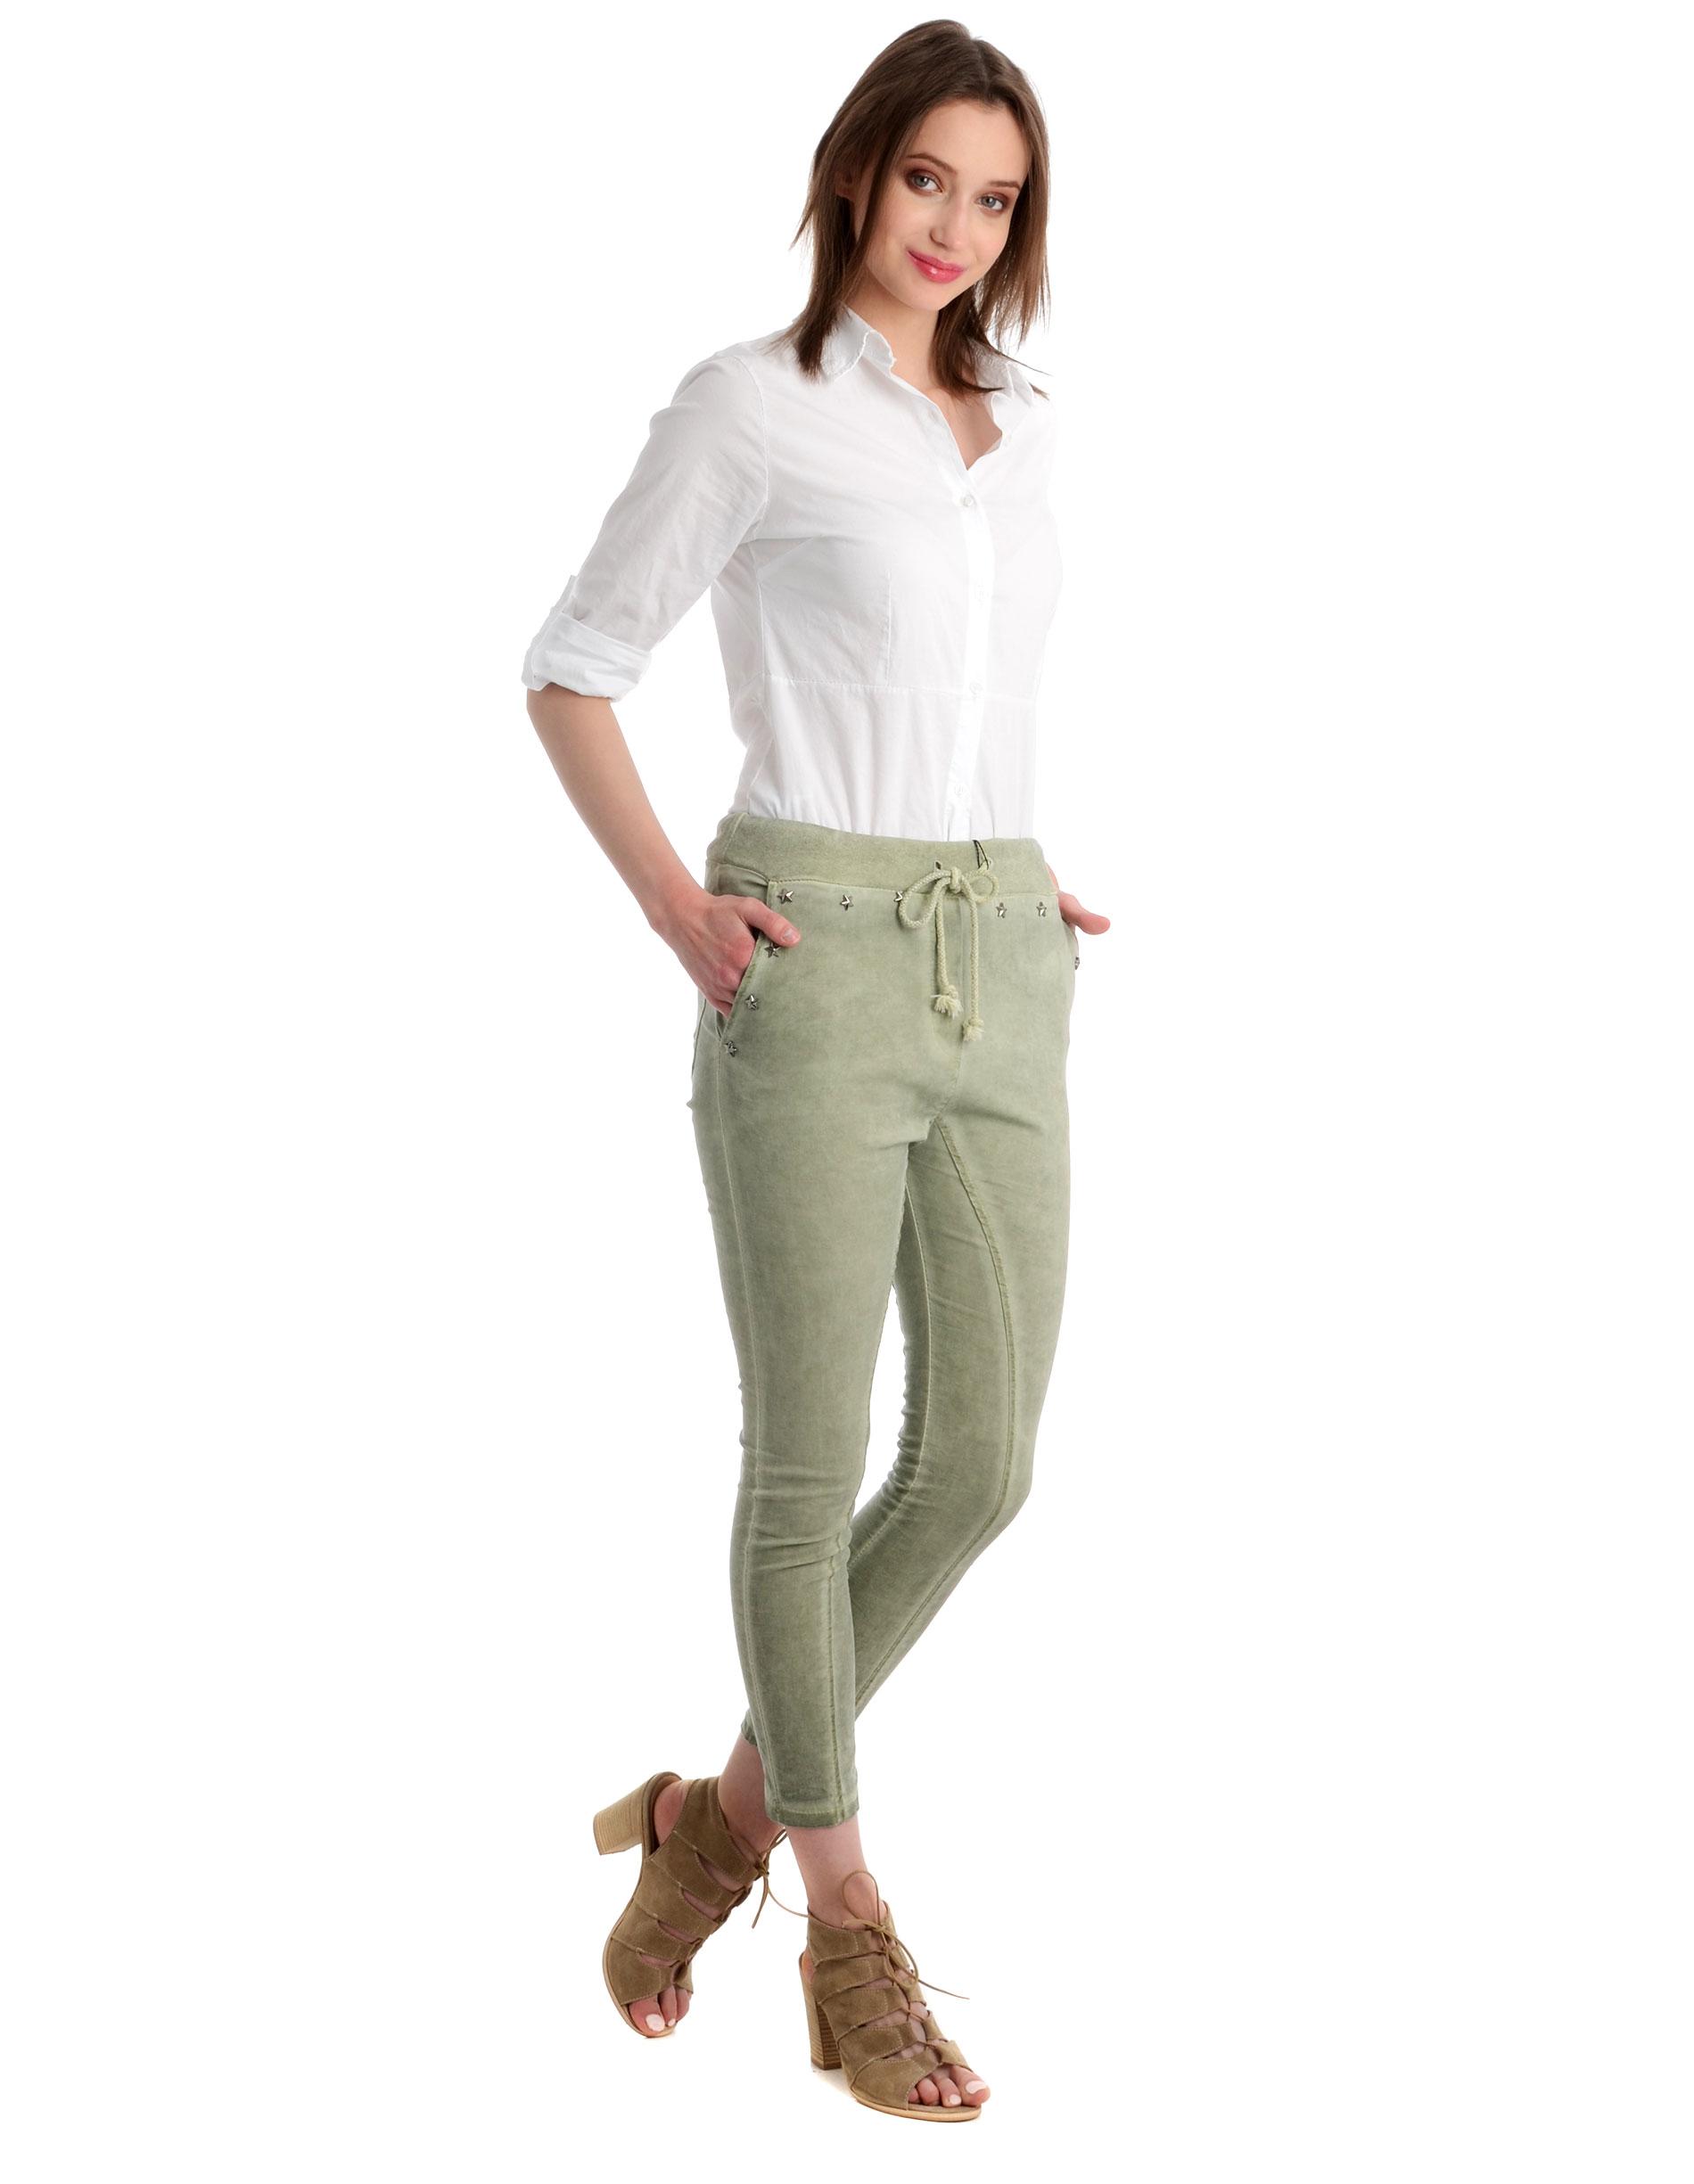 Spodnie - 141-P009 MILI - Unisono